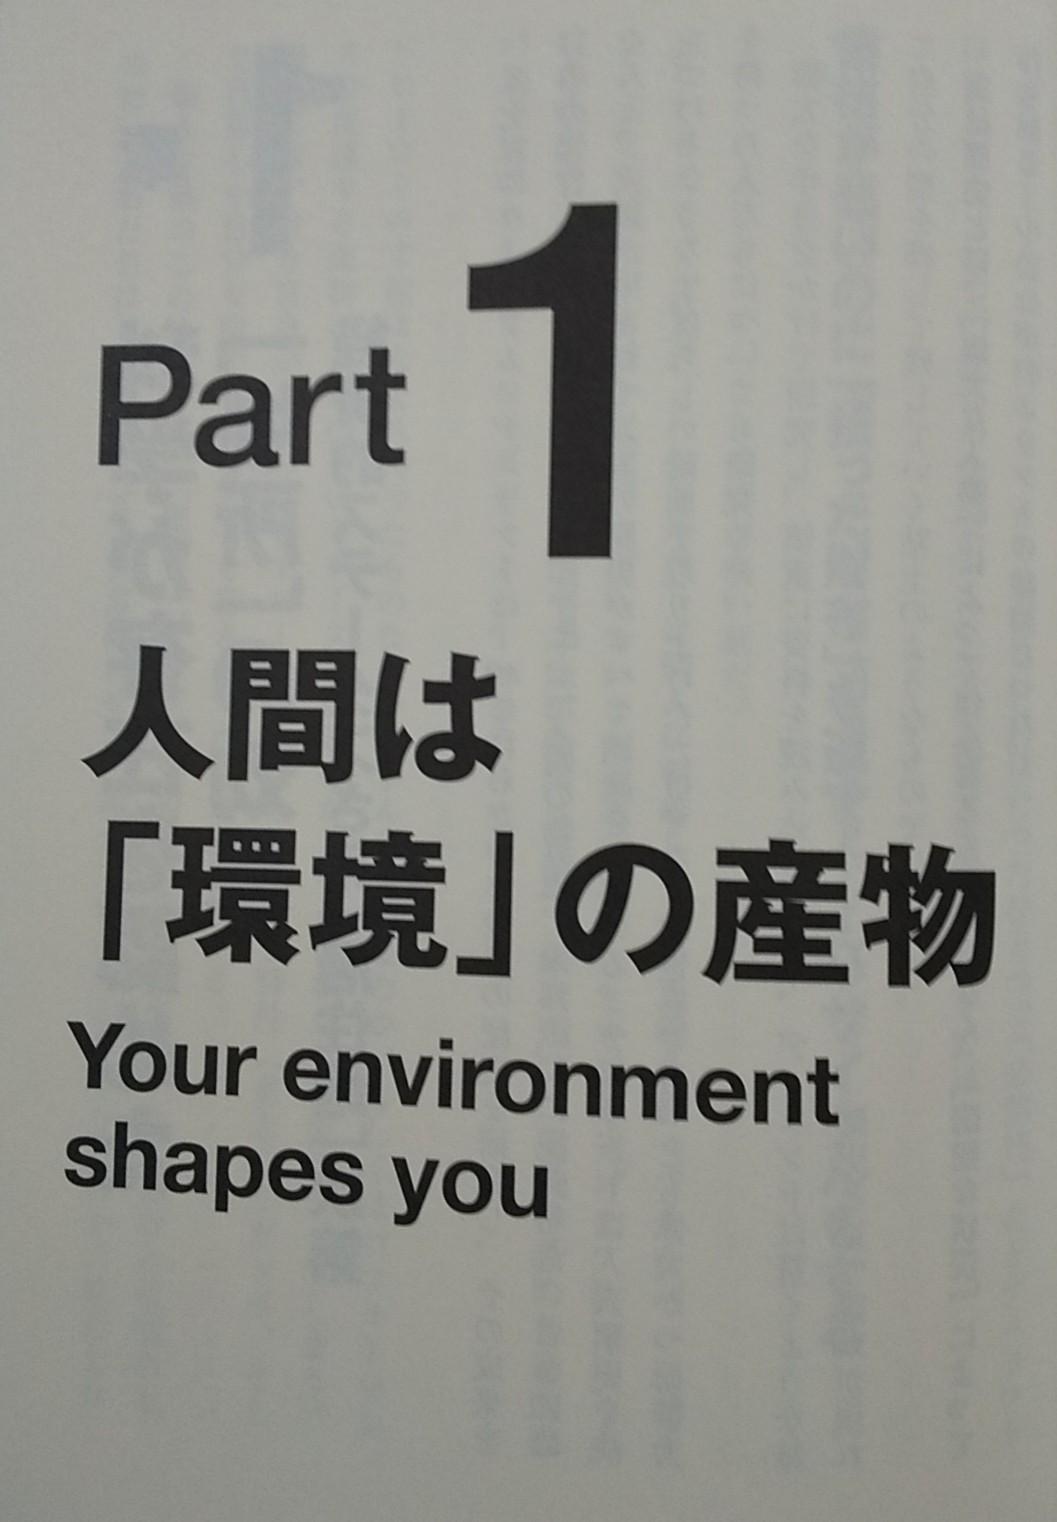 No.4579 3月23日(月):「自分を変える」のではなく「環境を変える」 ~意志力など役に立たない~_b0113993_14053639.jpg